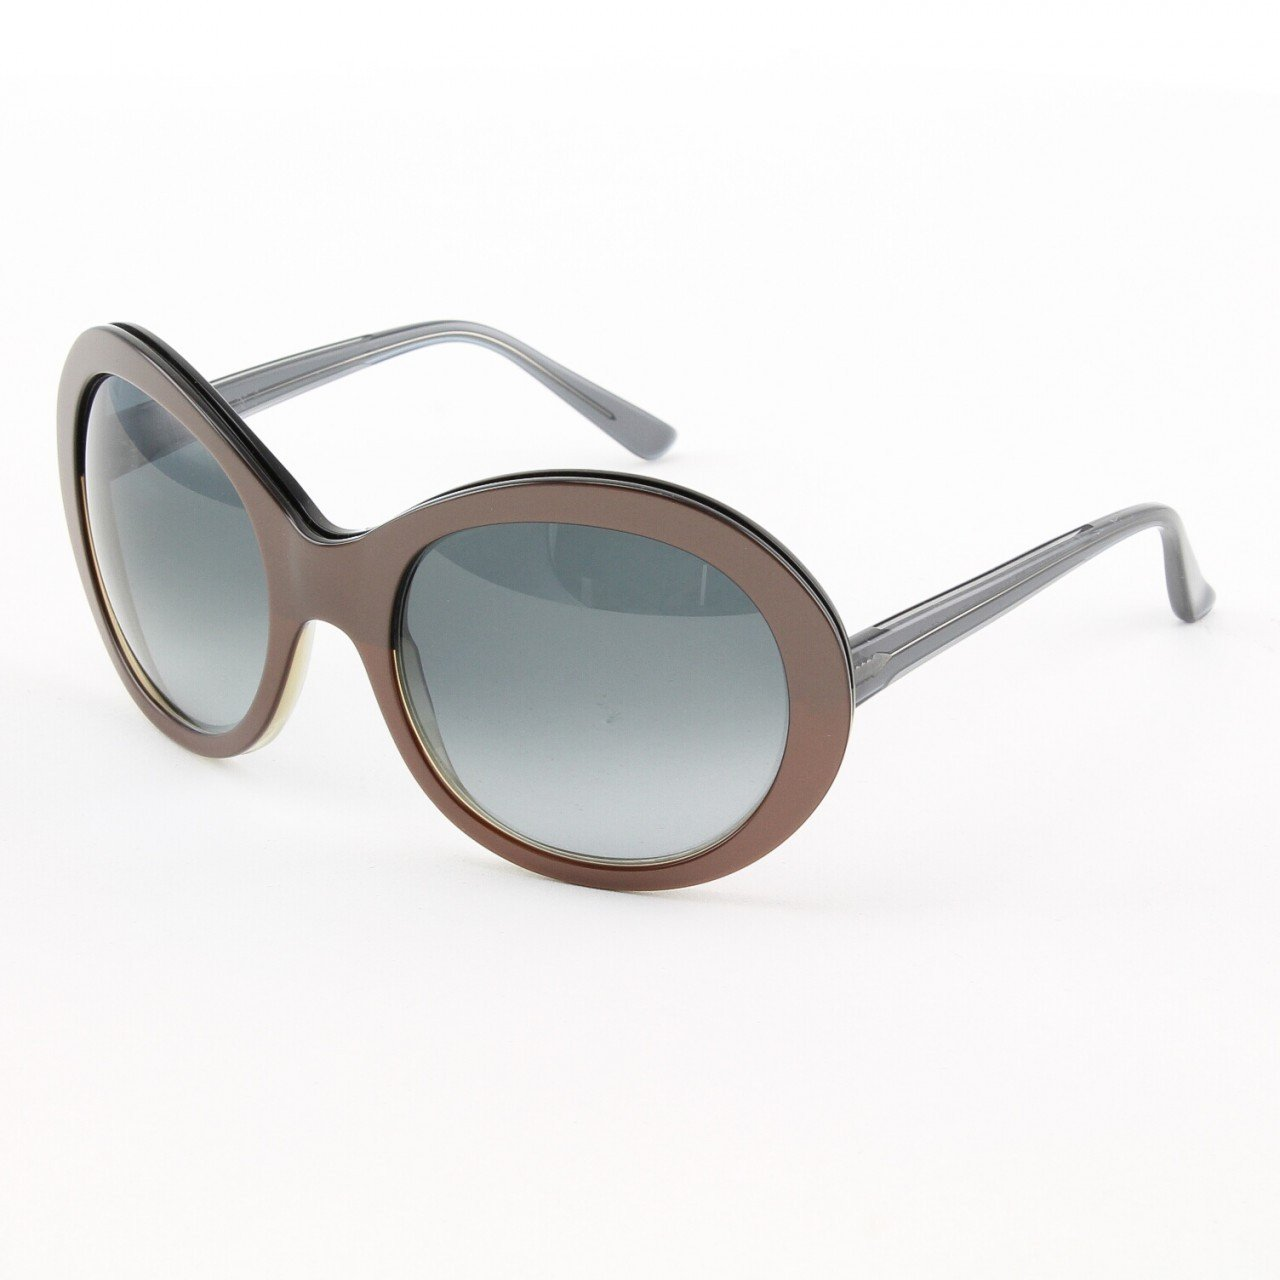 Marni MA162S Sunglasses Col. 07 Oversized Copper Frame with Gray Gradient Lenses